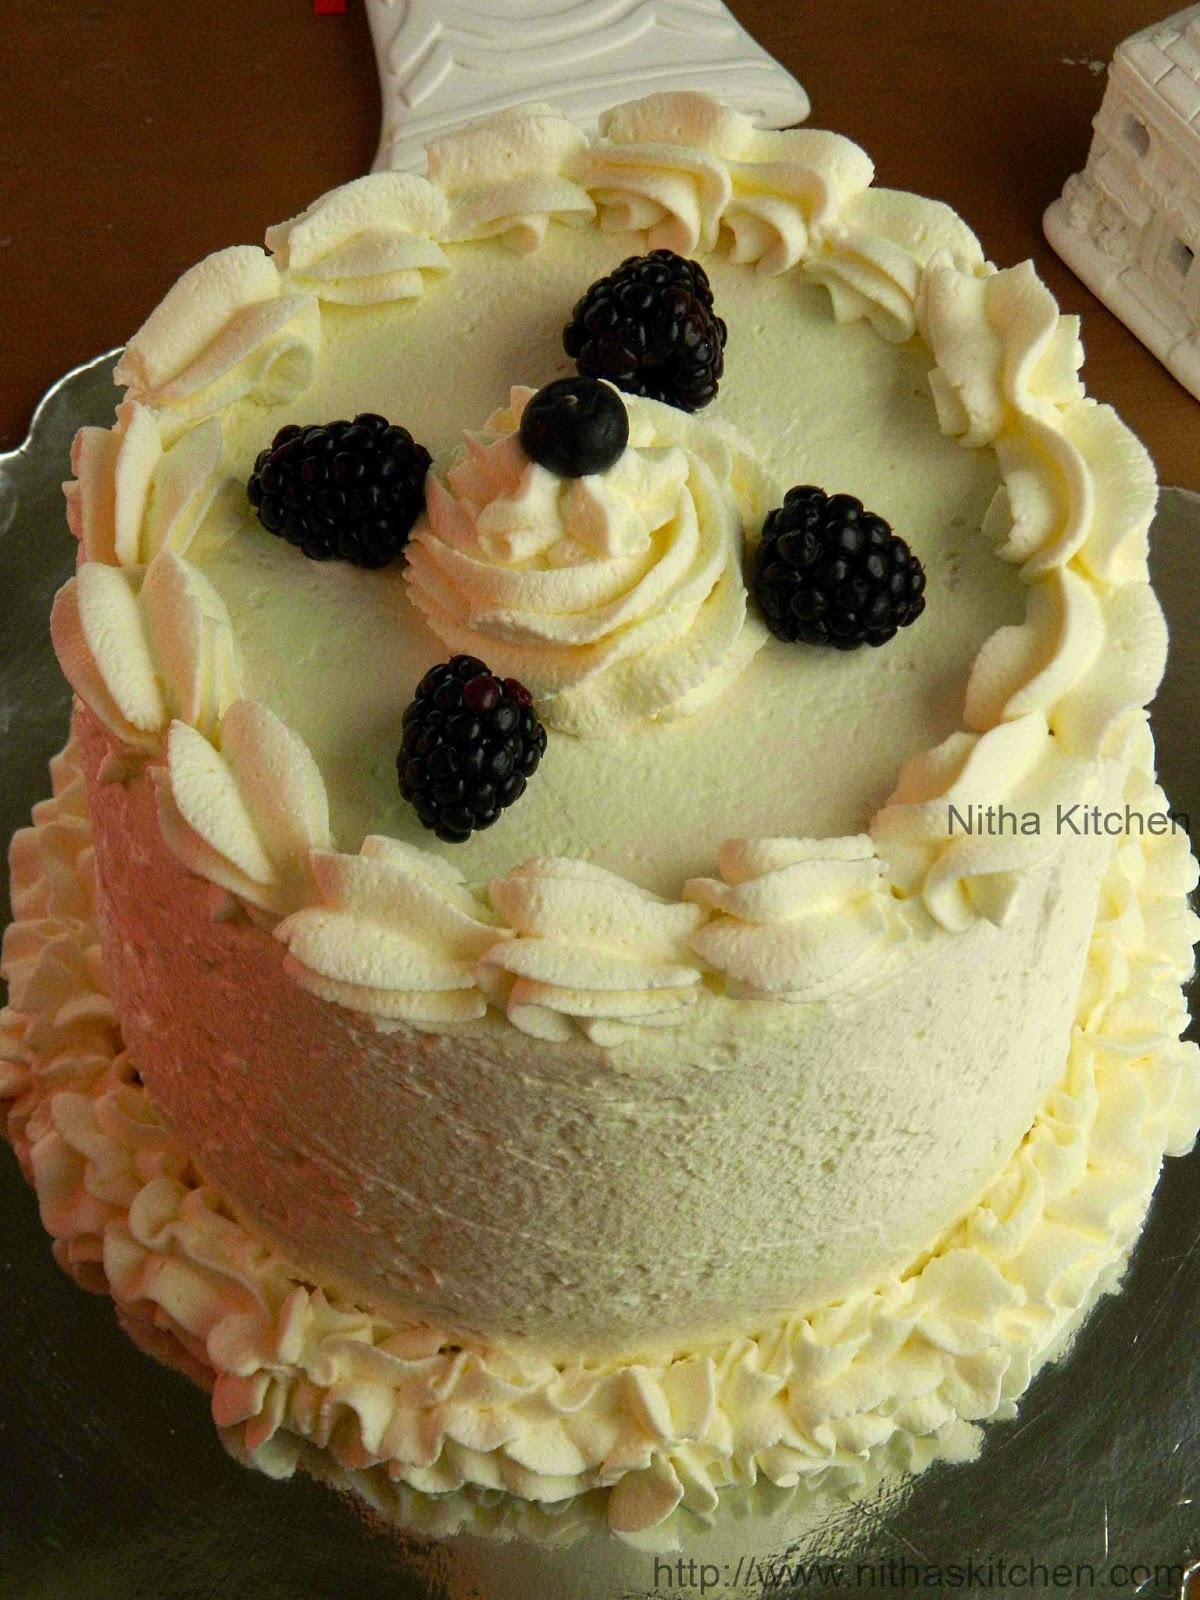 Joan's Cake | Rainbow Cake Recipe using Whipped Cream Frosting